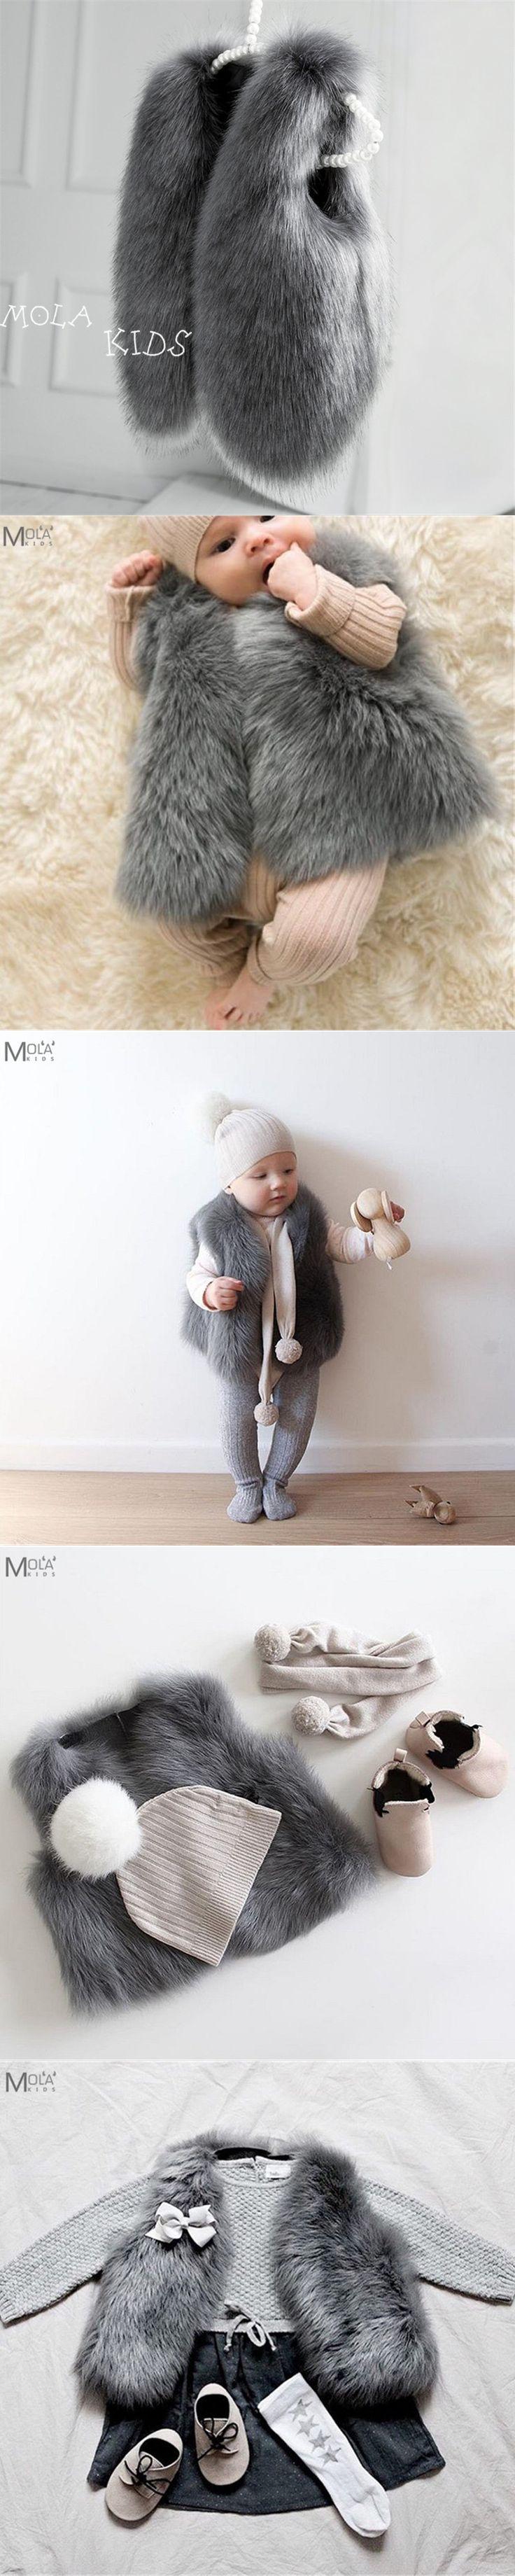 Baby Fur Coat Real Fur Clothes Infant Winter Vest Toddler Boys/Girl WInter Waistcoat Toddler faux Fur Vest Bobo Choses BEBE